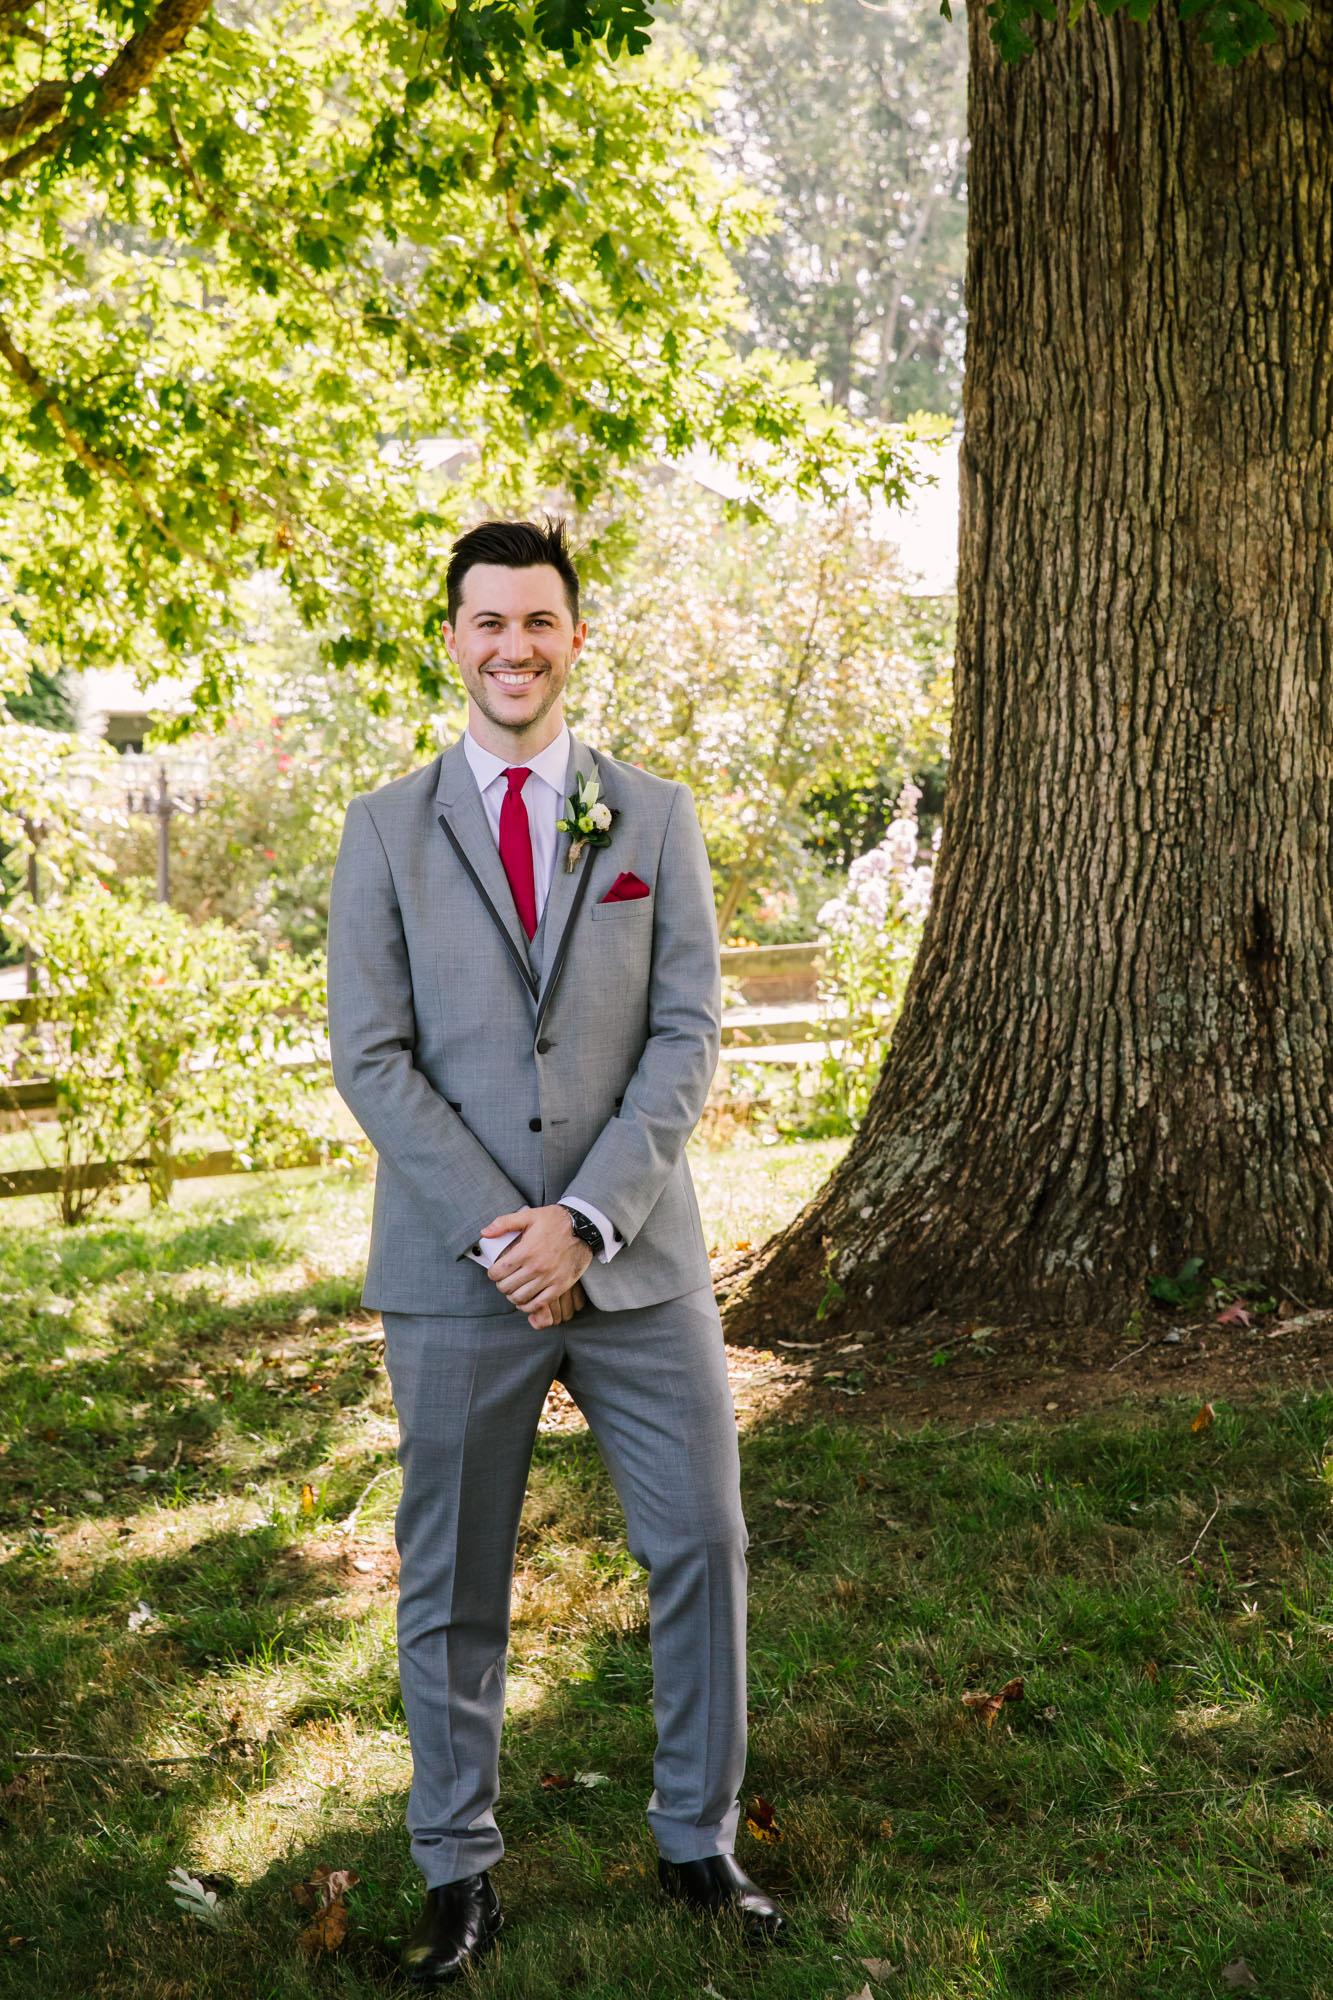 Waynesville NC Wedding Photography | Groom Solo Portrait Full Body